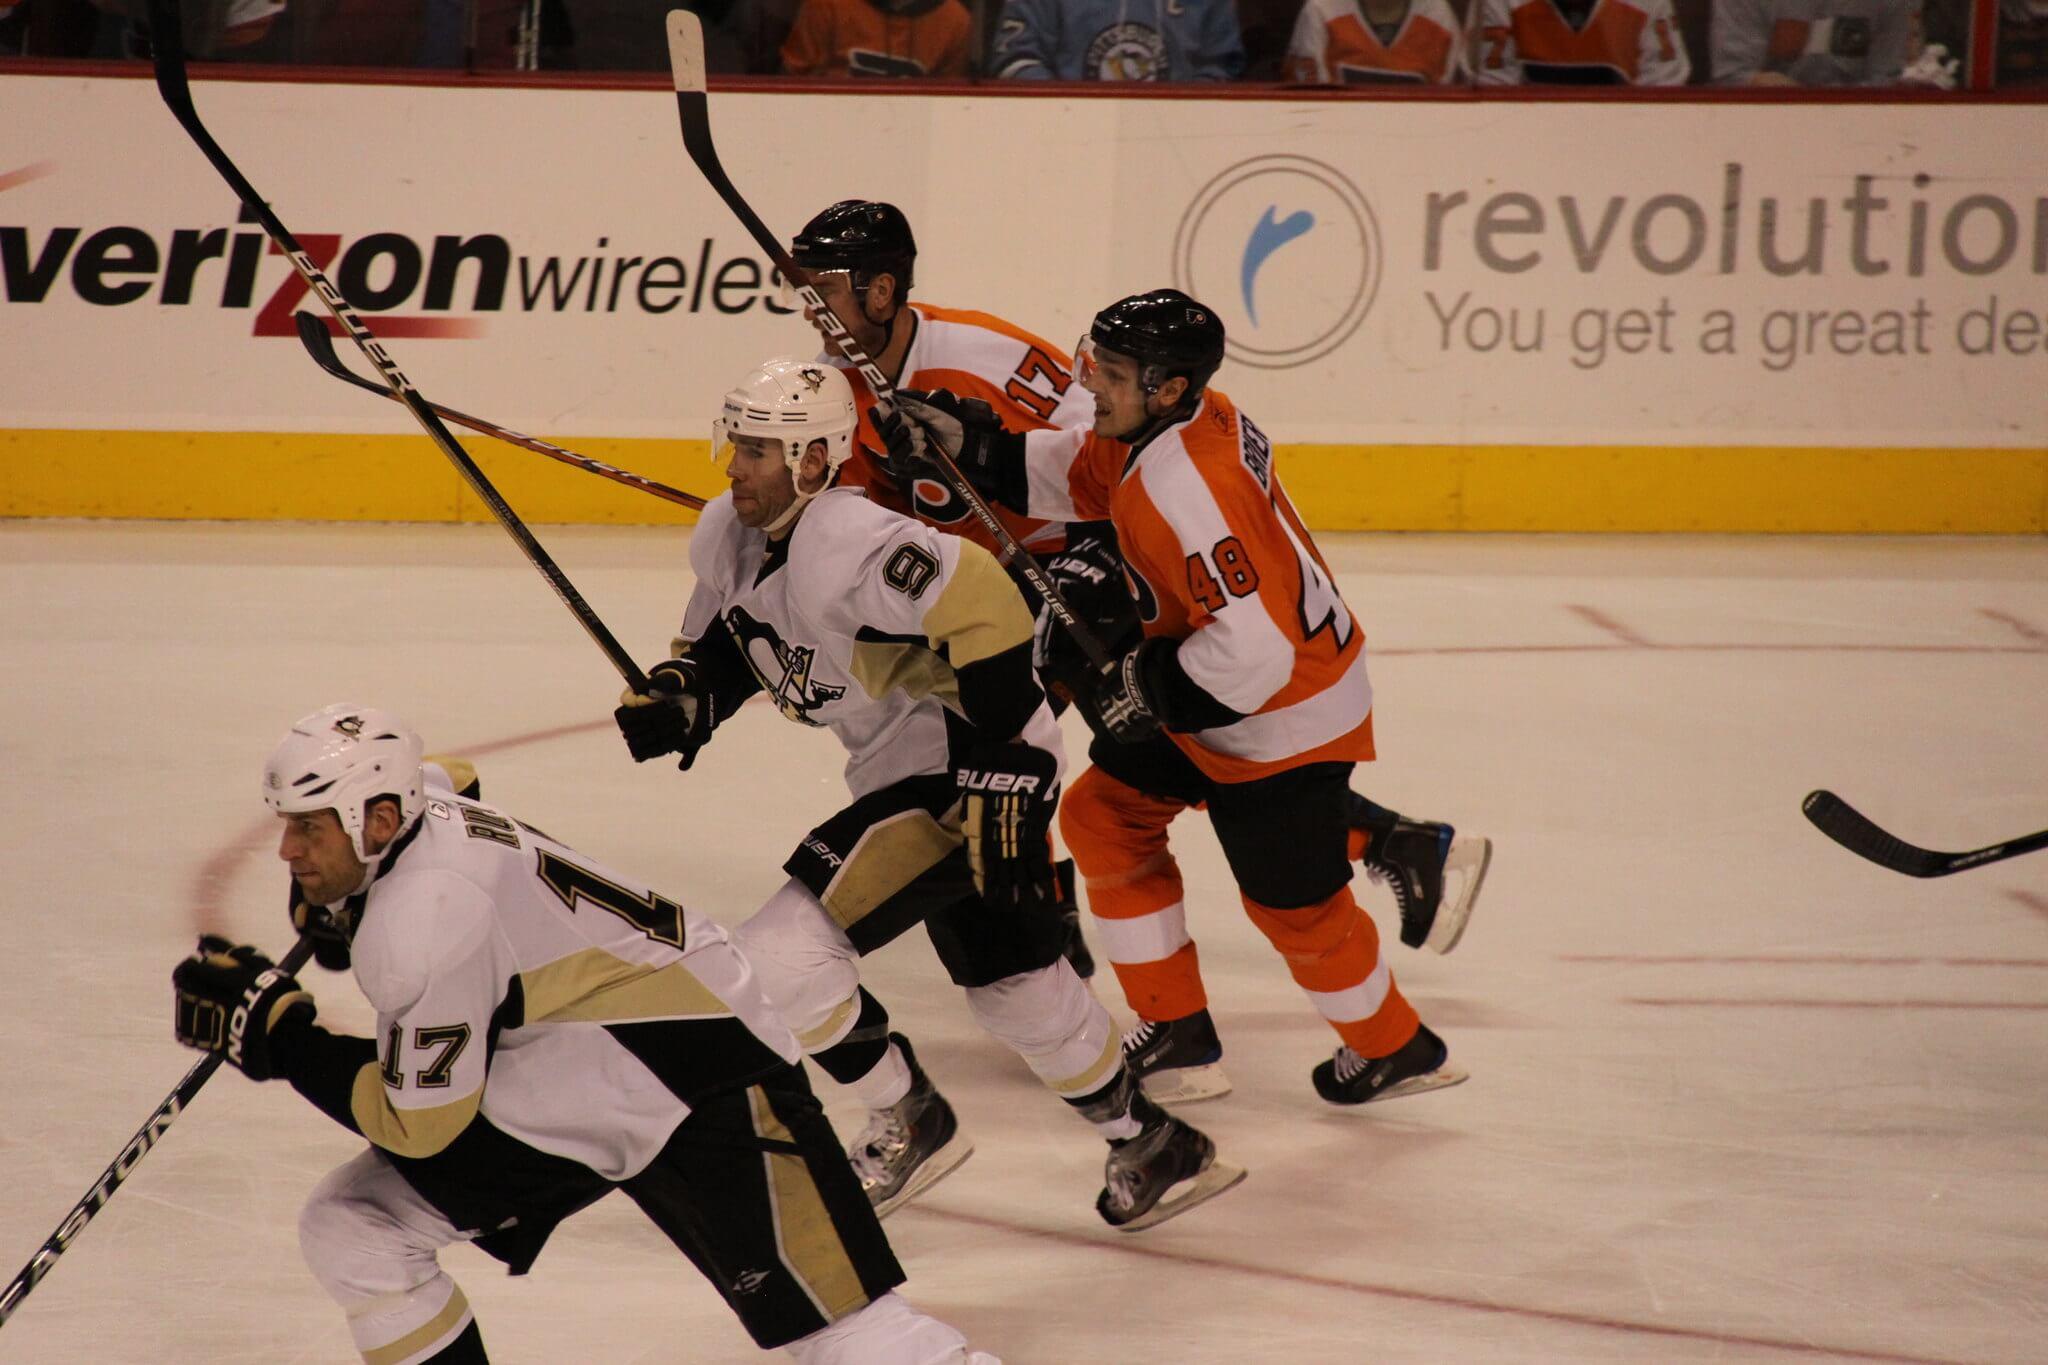 Pittsburgh Penguins vs Philadelphia Flyers NHL hockey rivalry